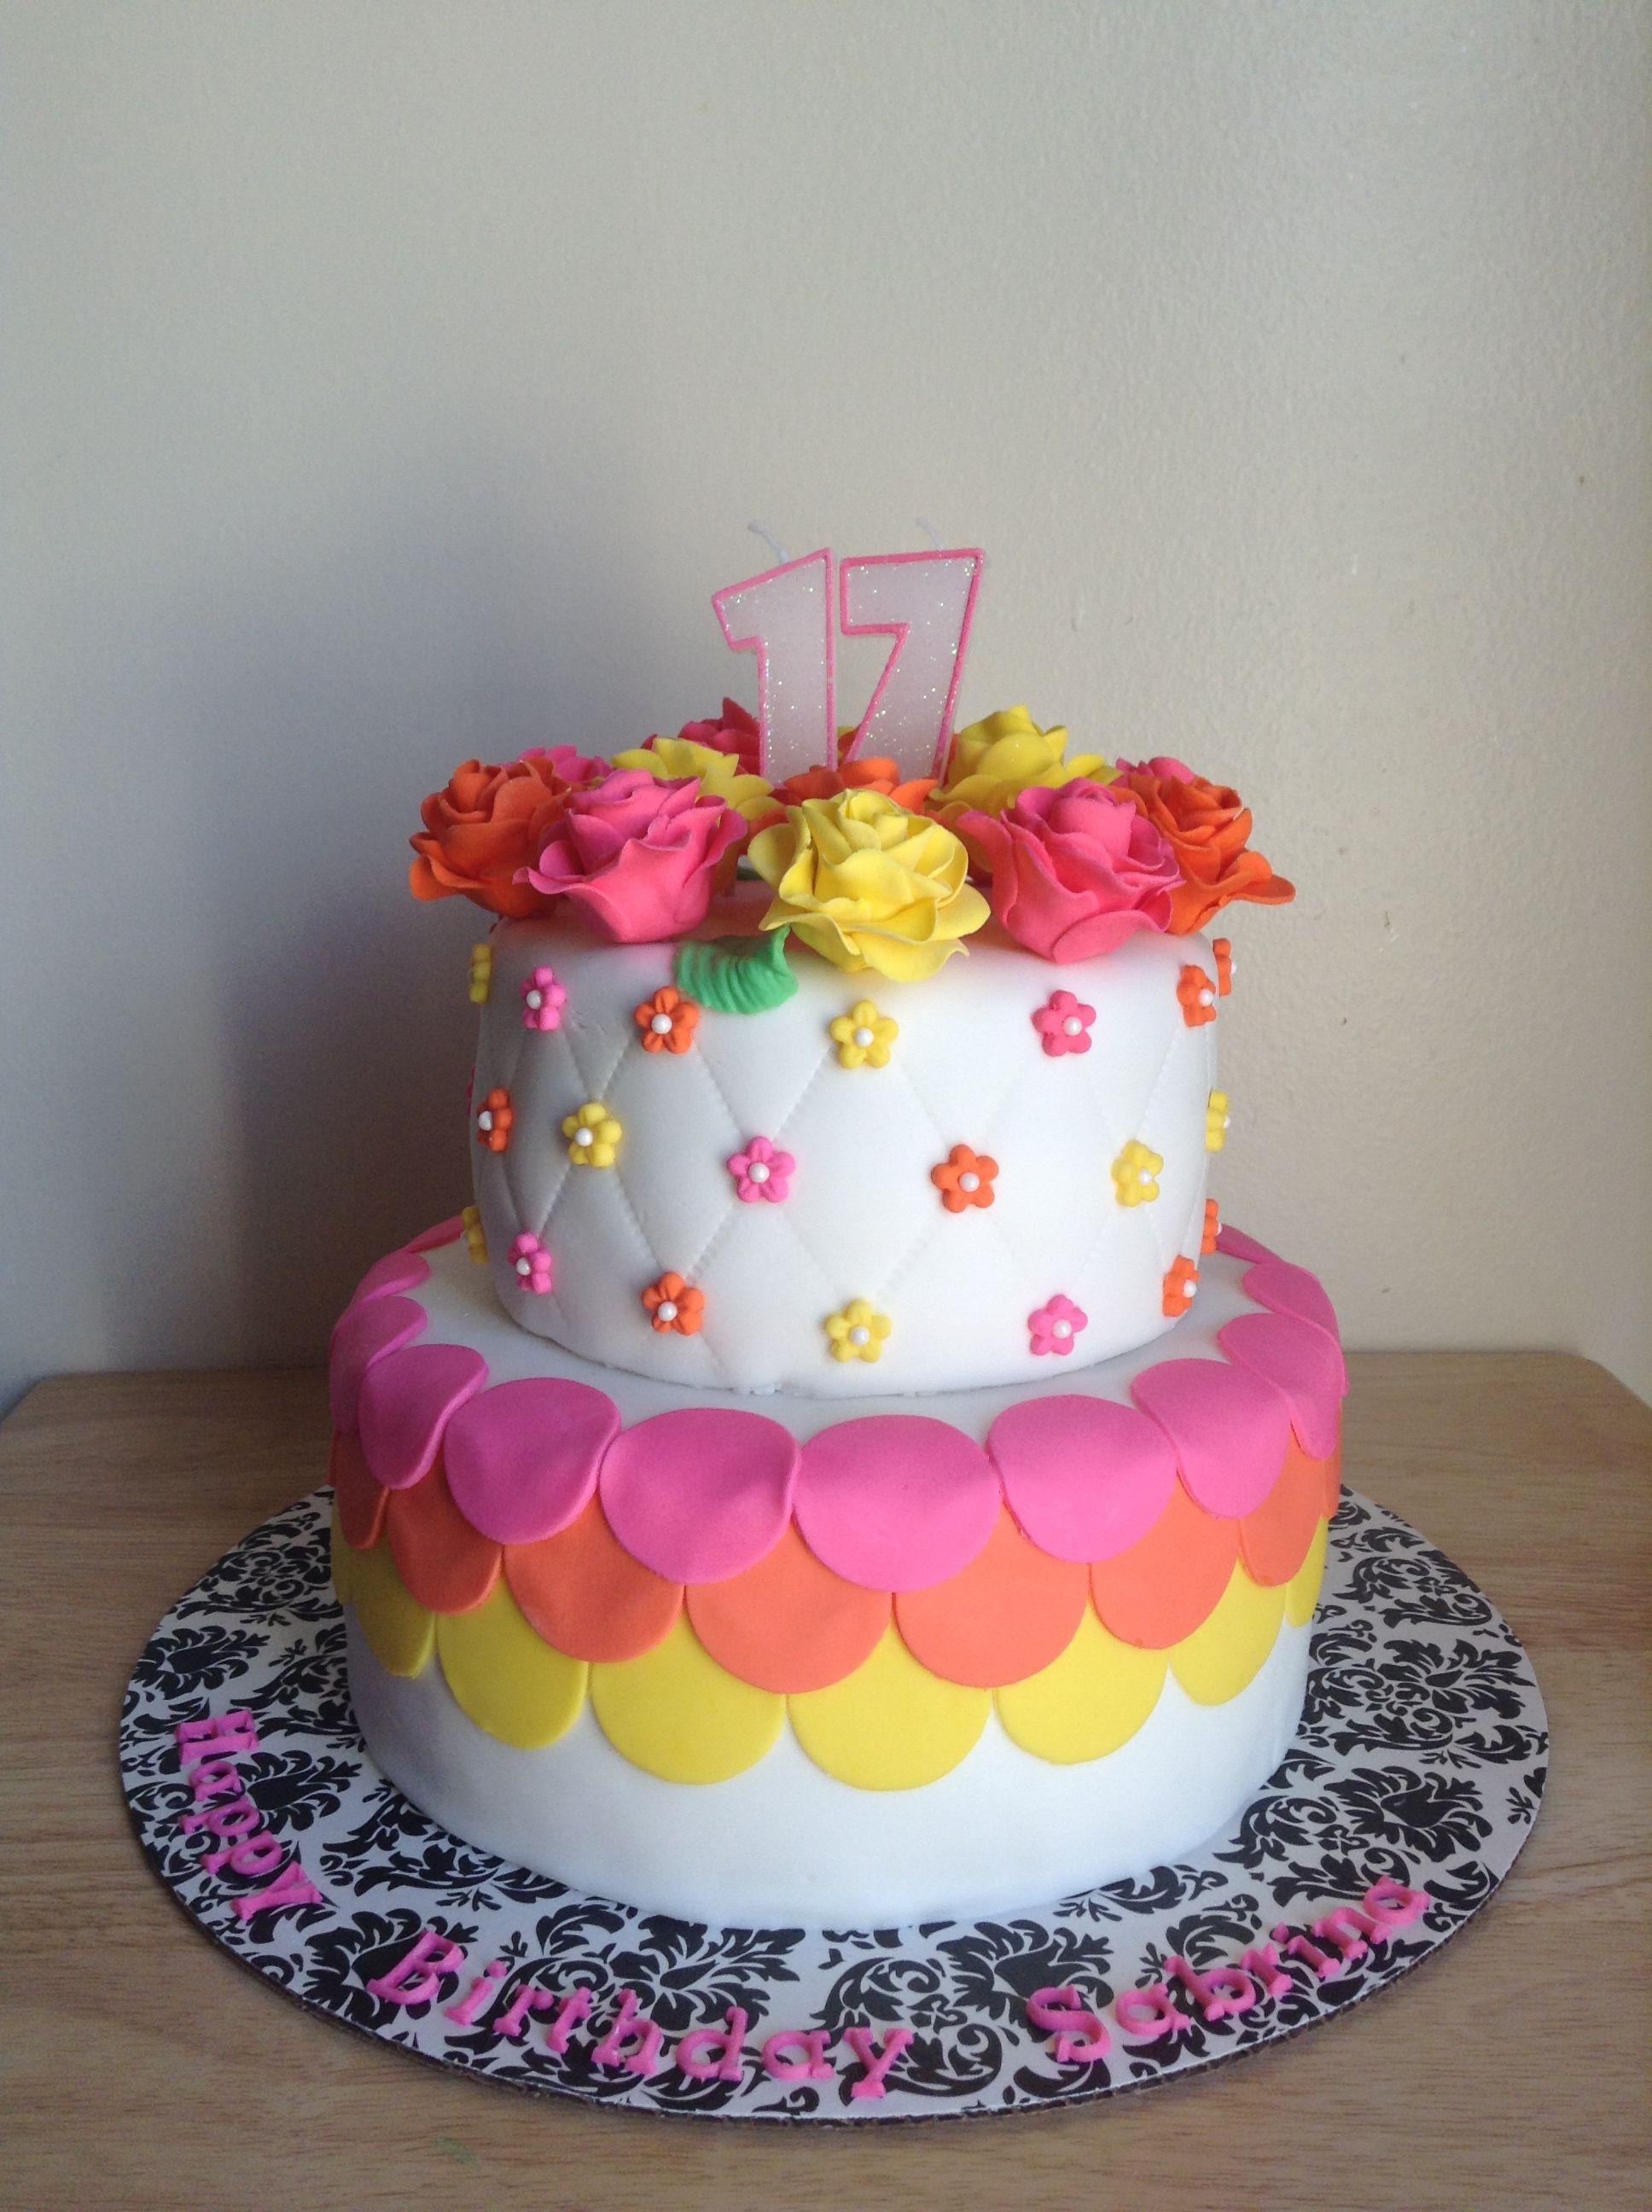 17th Birthday Cake Cake Pinterest 17th birthday cakes 17